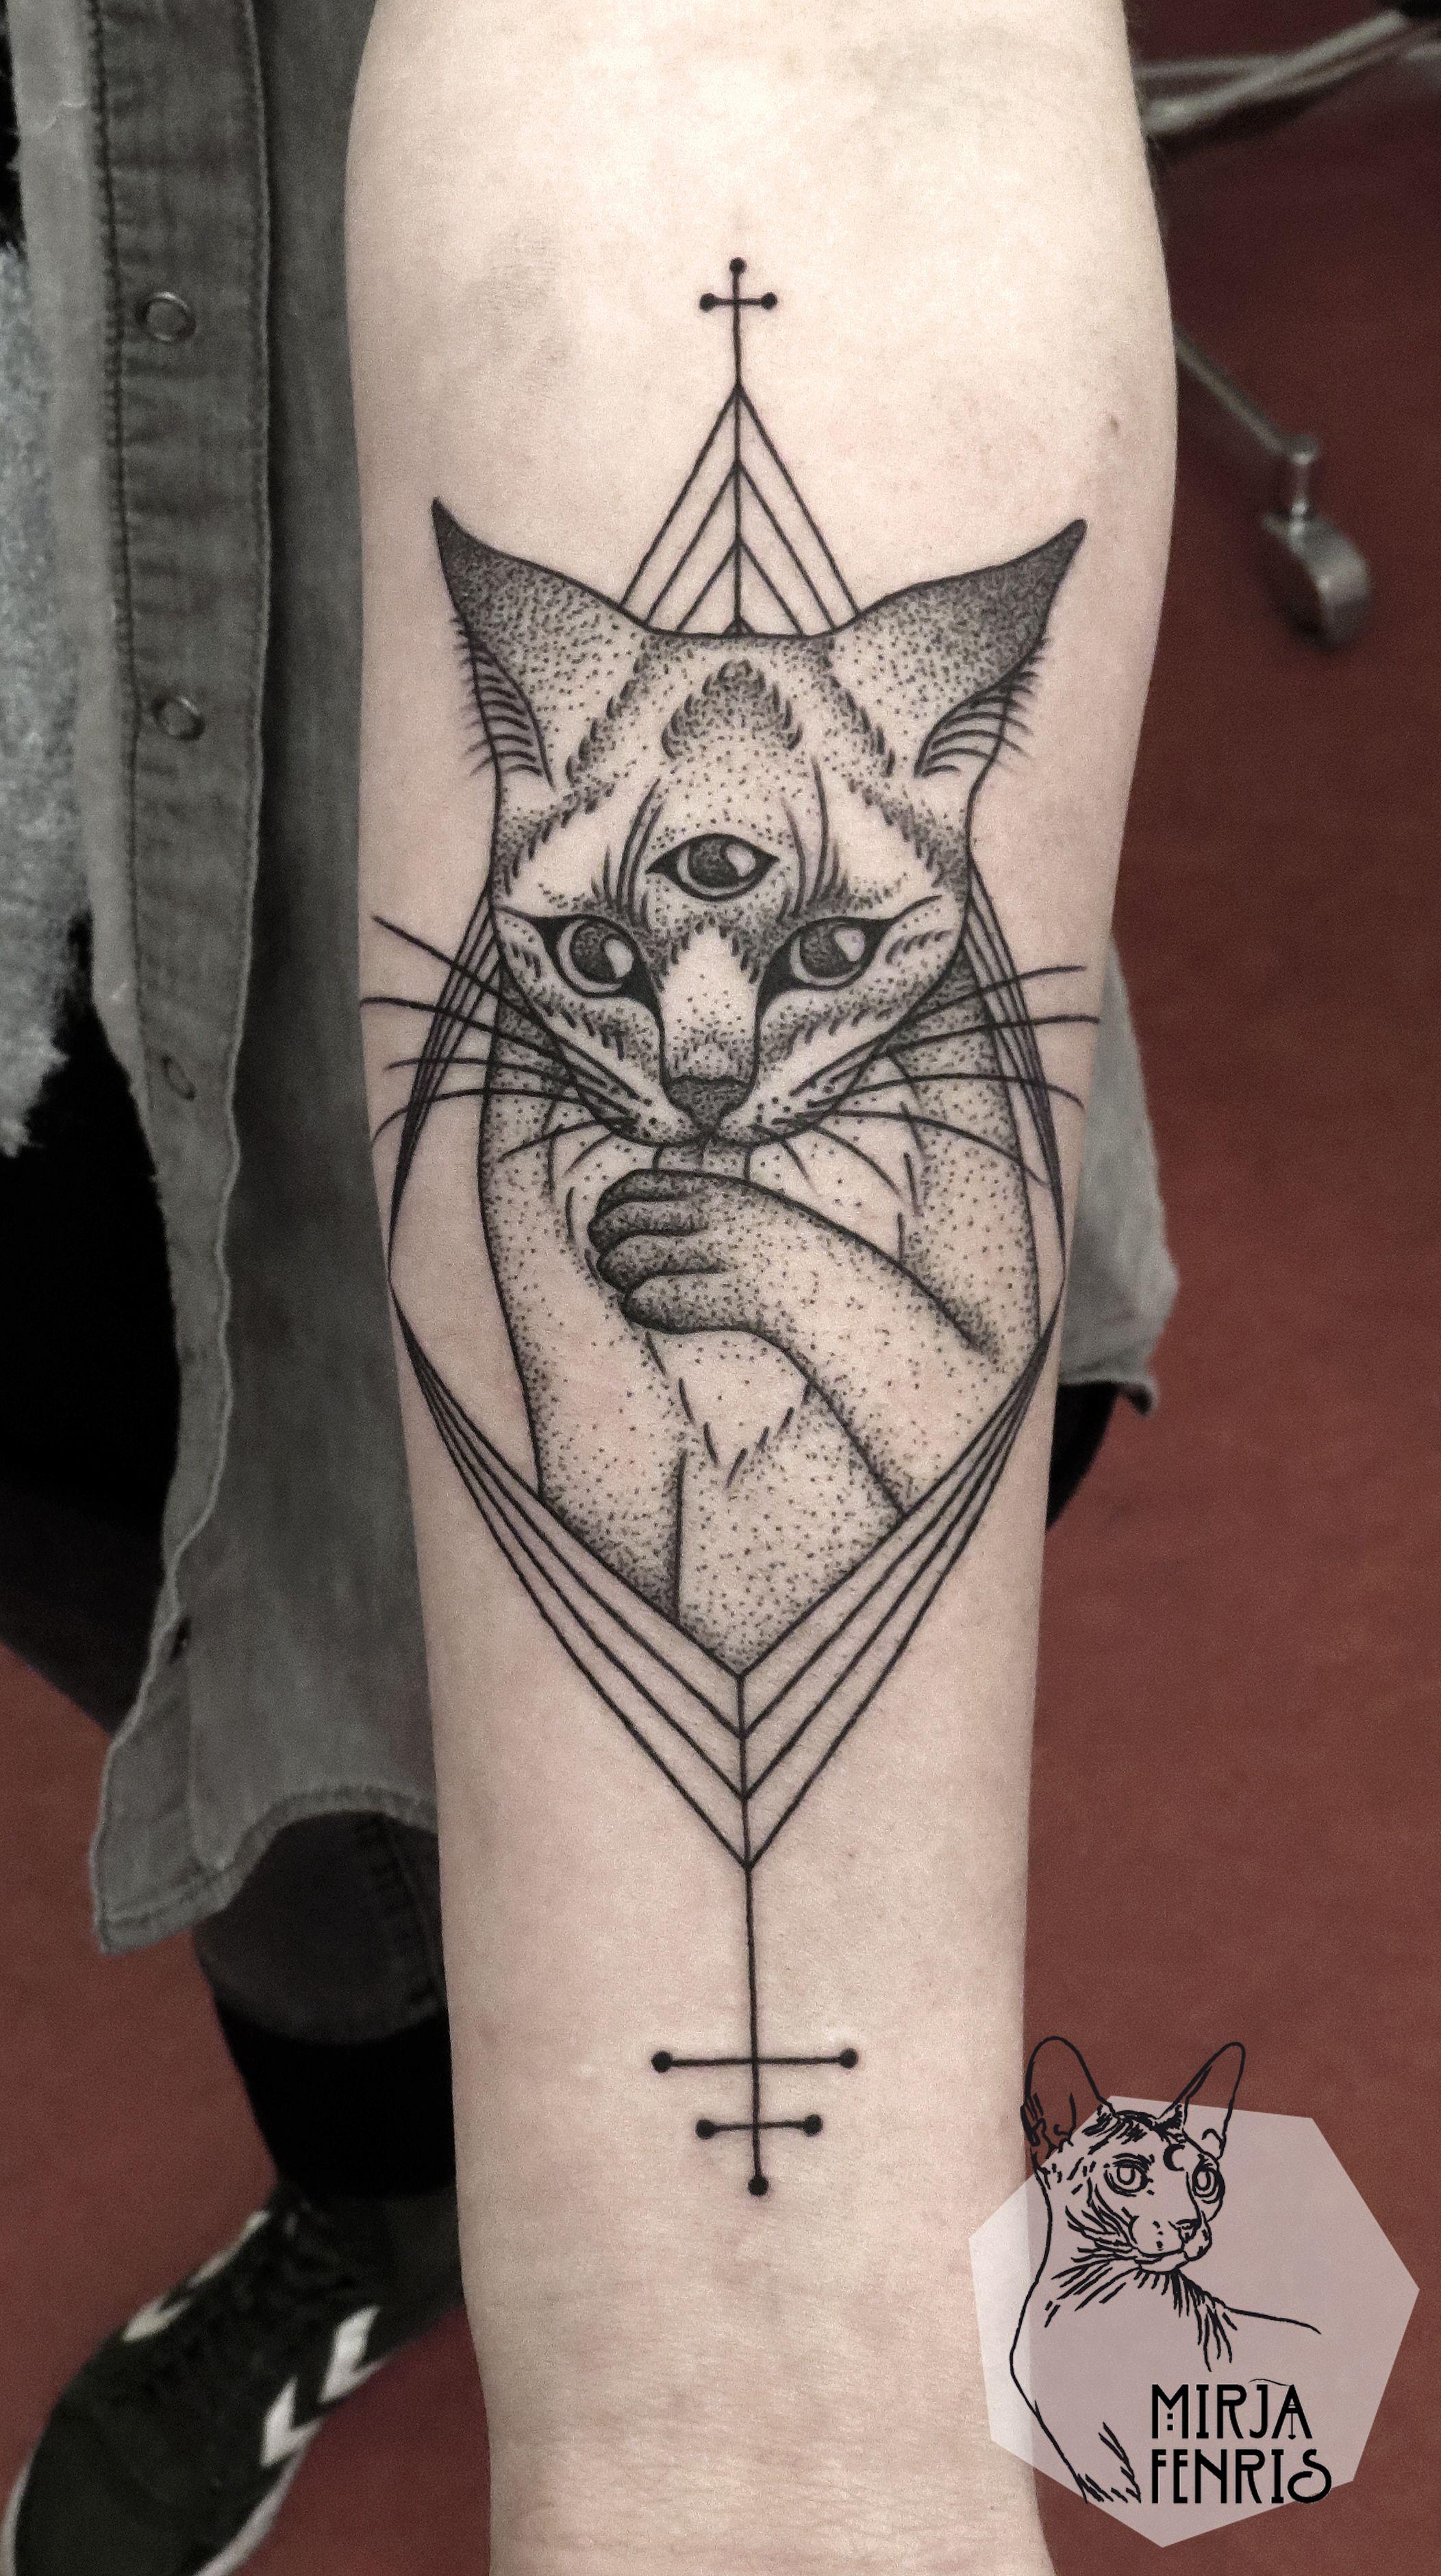 Mirja Fenris Tattoo Geometrisches Tattoo Geometrische Tattoos